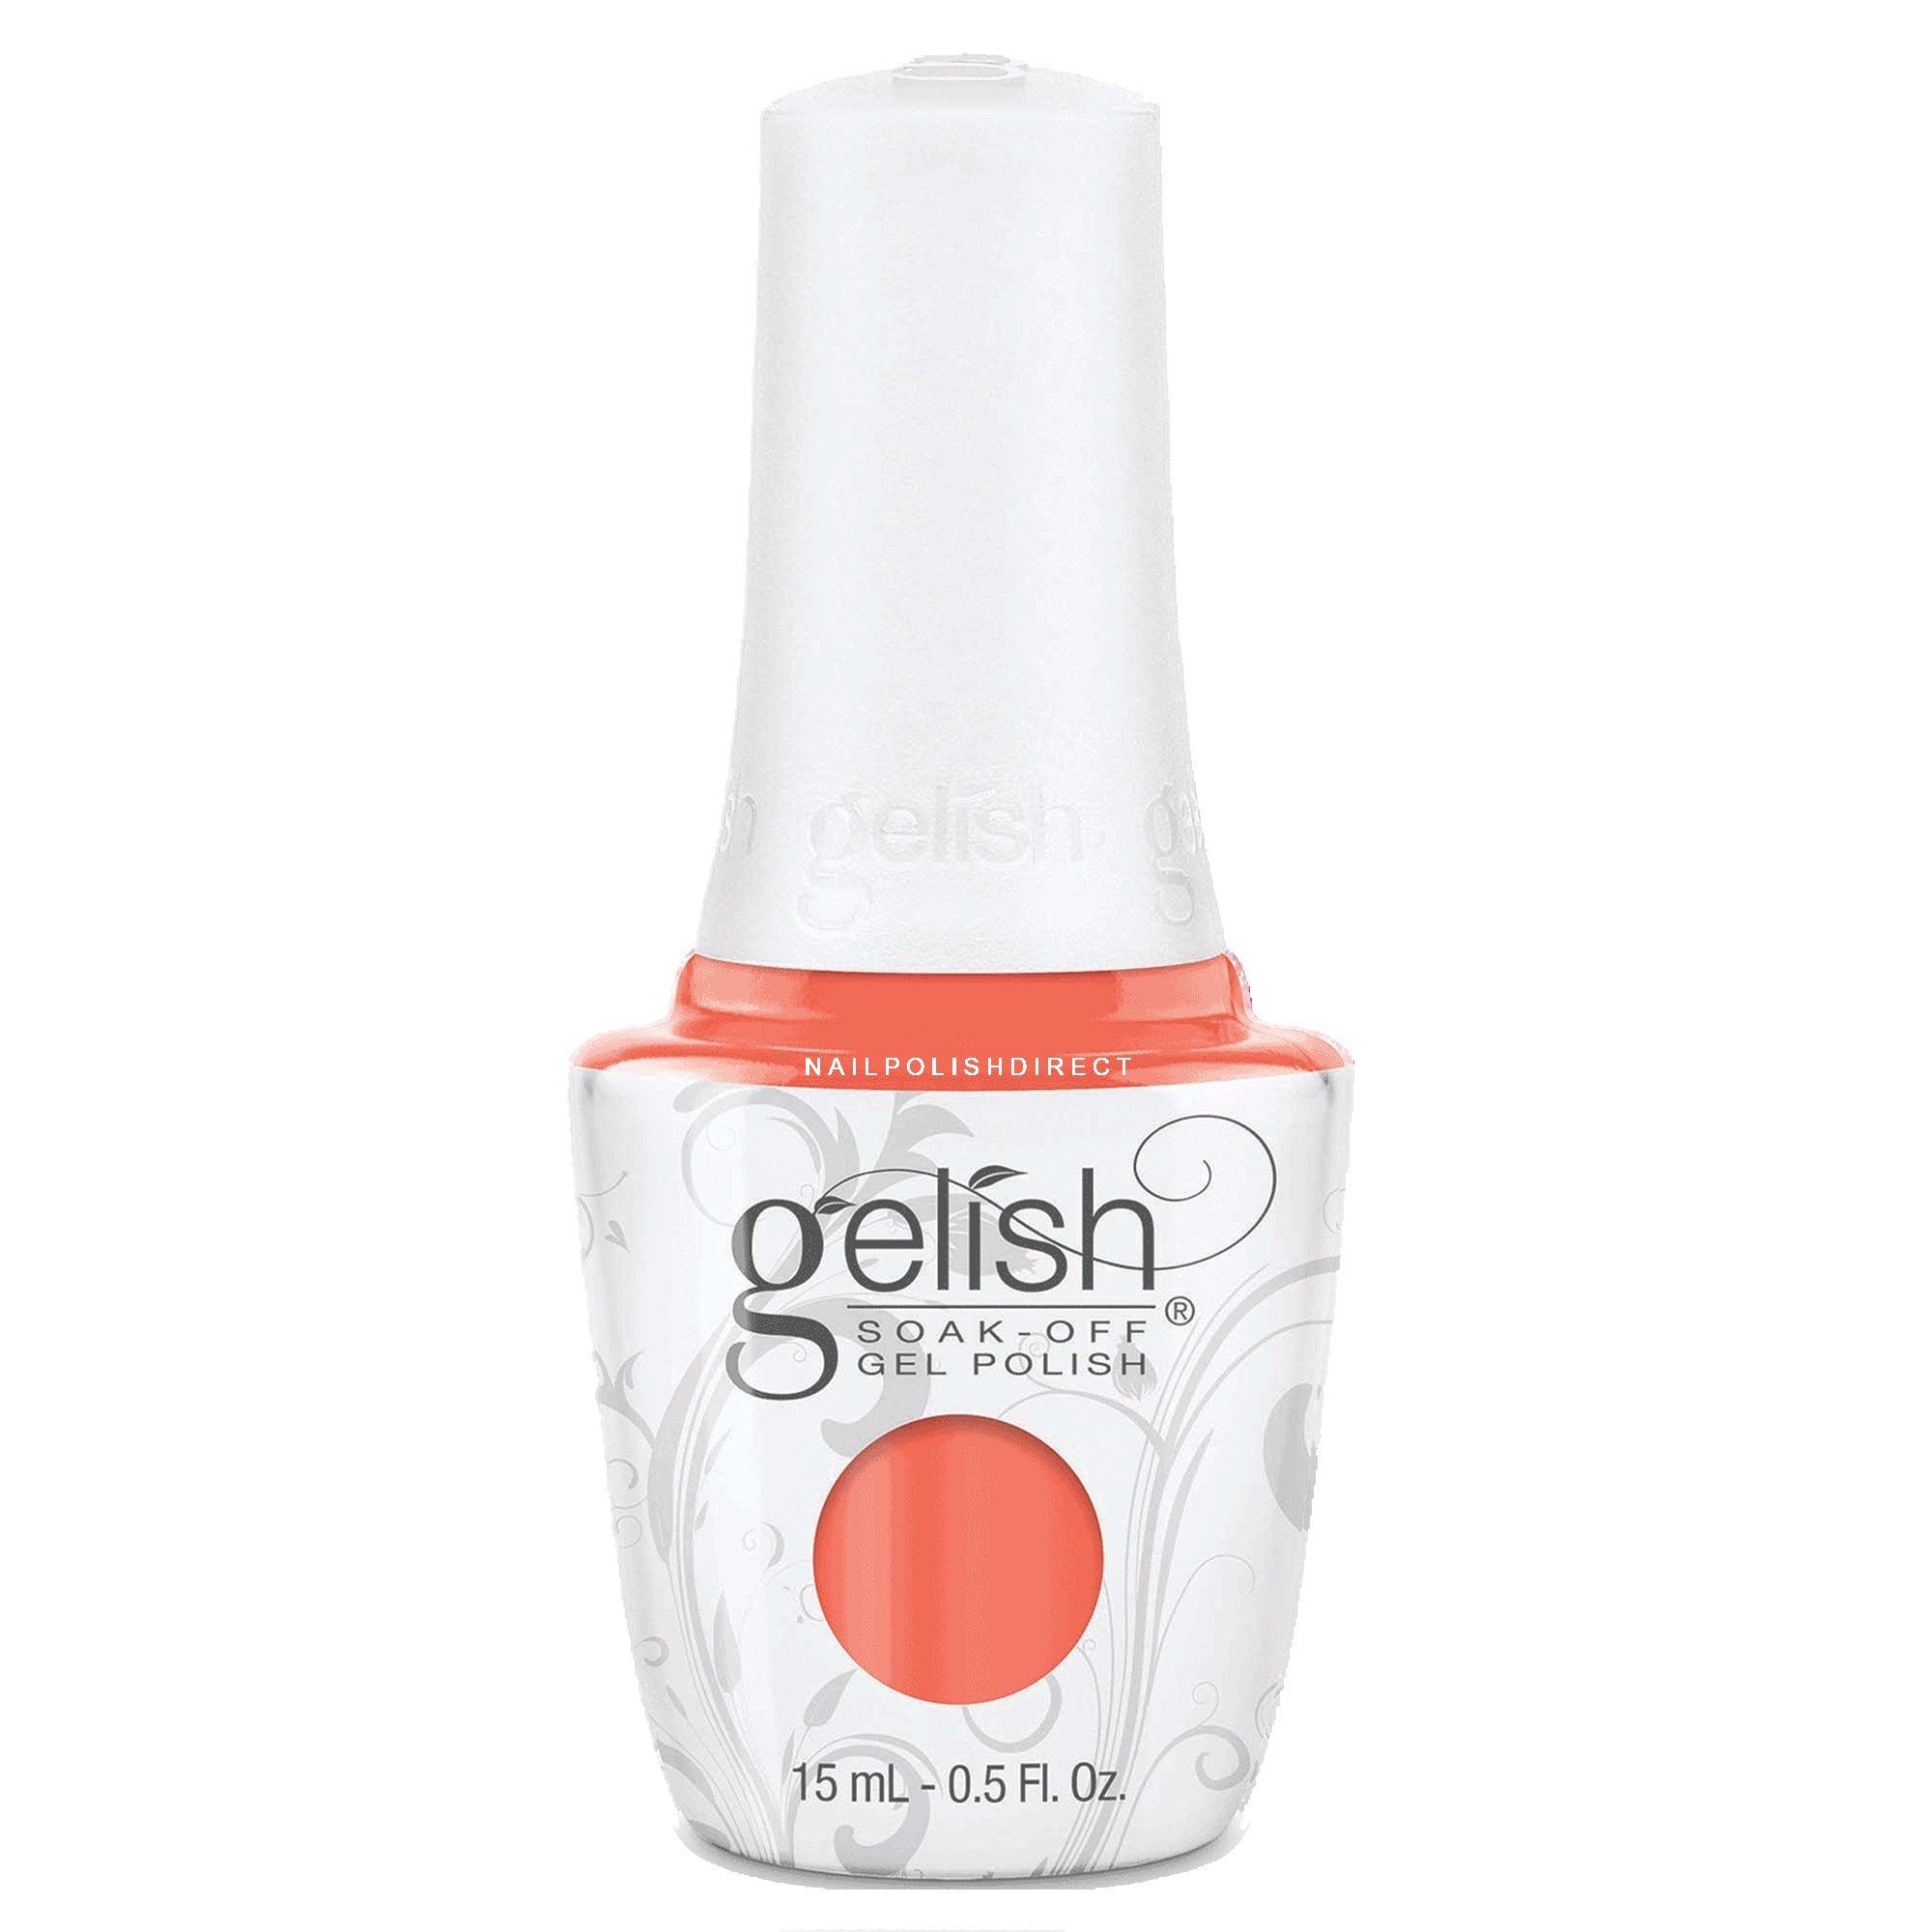 Gelish Soak-Off Gel Nail Polish - Rockin\' The Reef 15ml